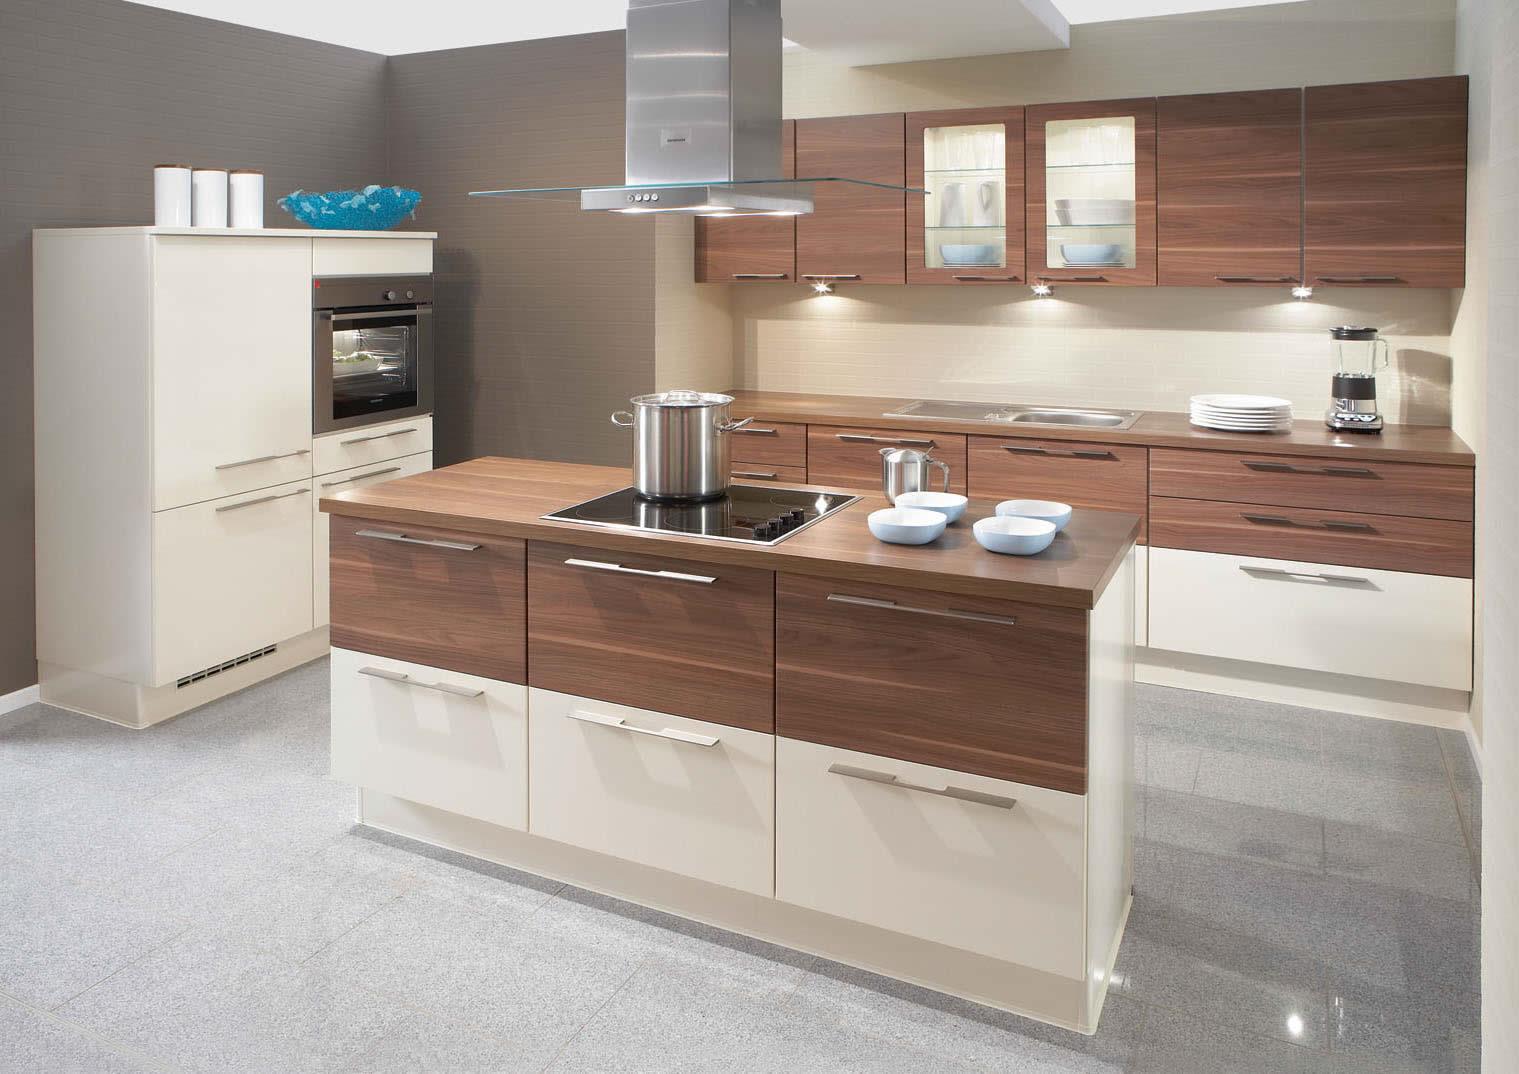 Kitchen Set Minimalis Untuk Dapur Kecil Dapur Cantik Dengan